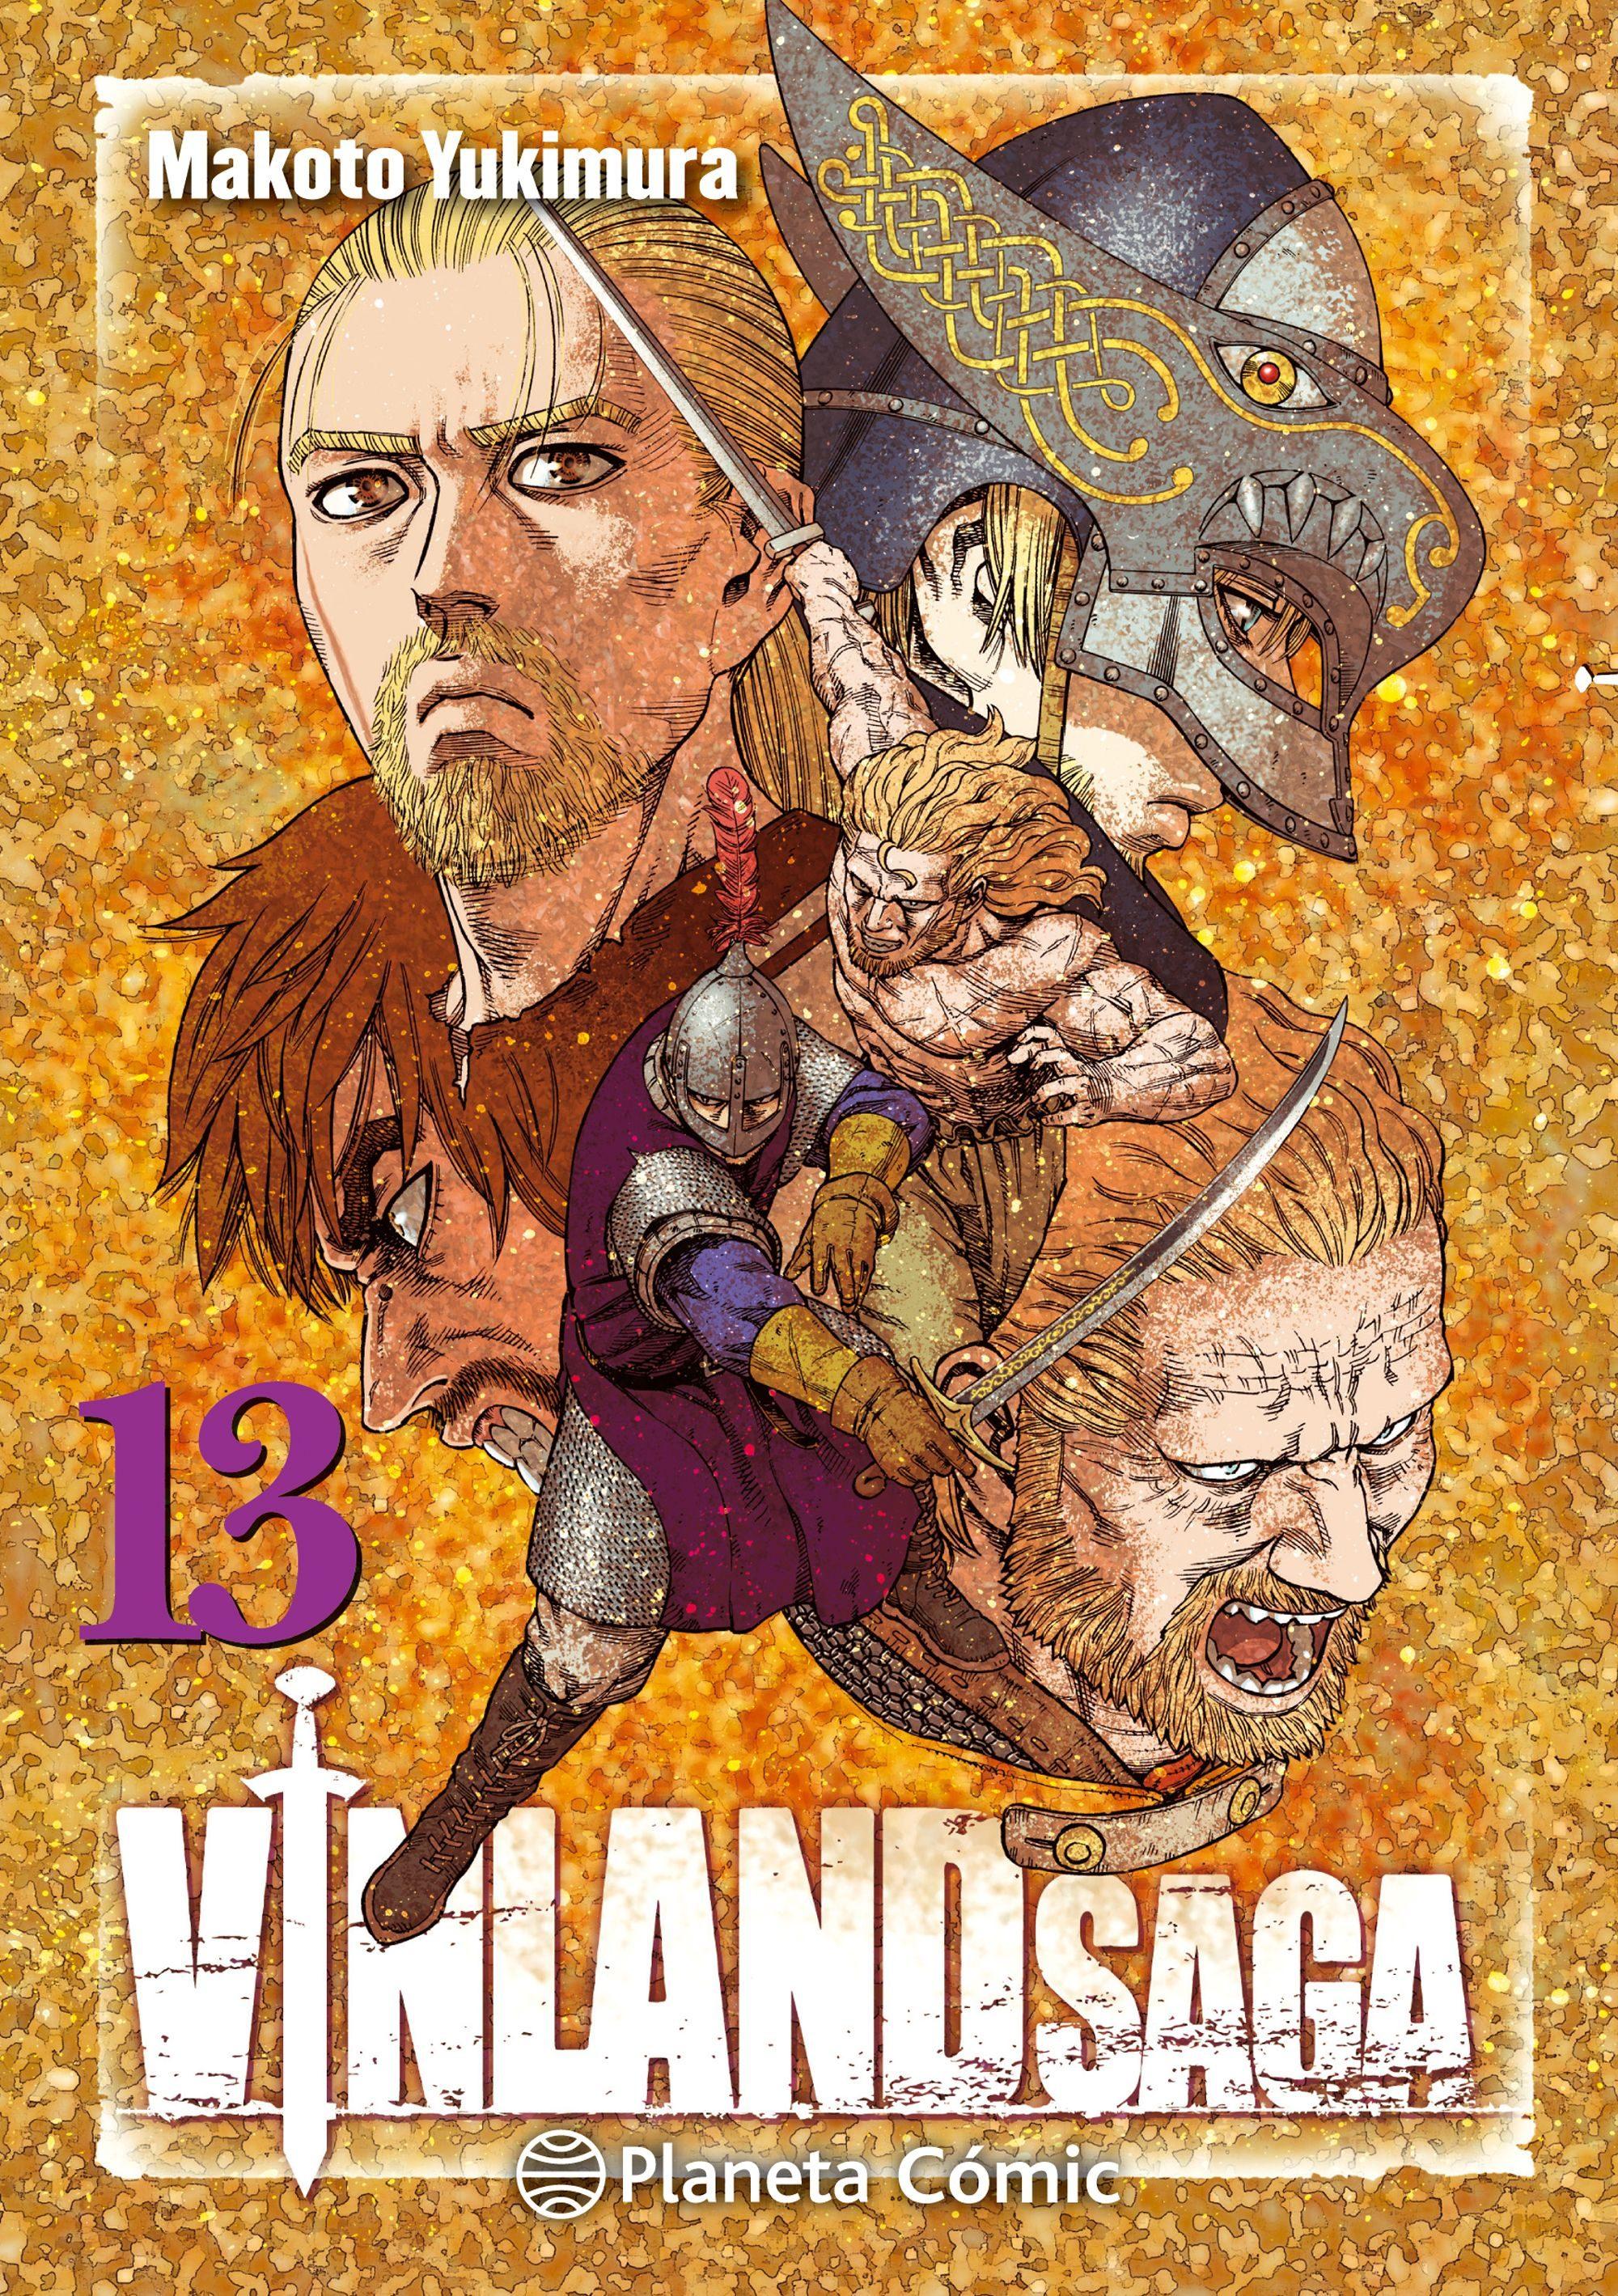 Vinland Saga nº 13 - Makoto Yukimura - Planeta Cómic